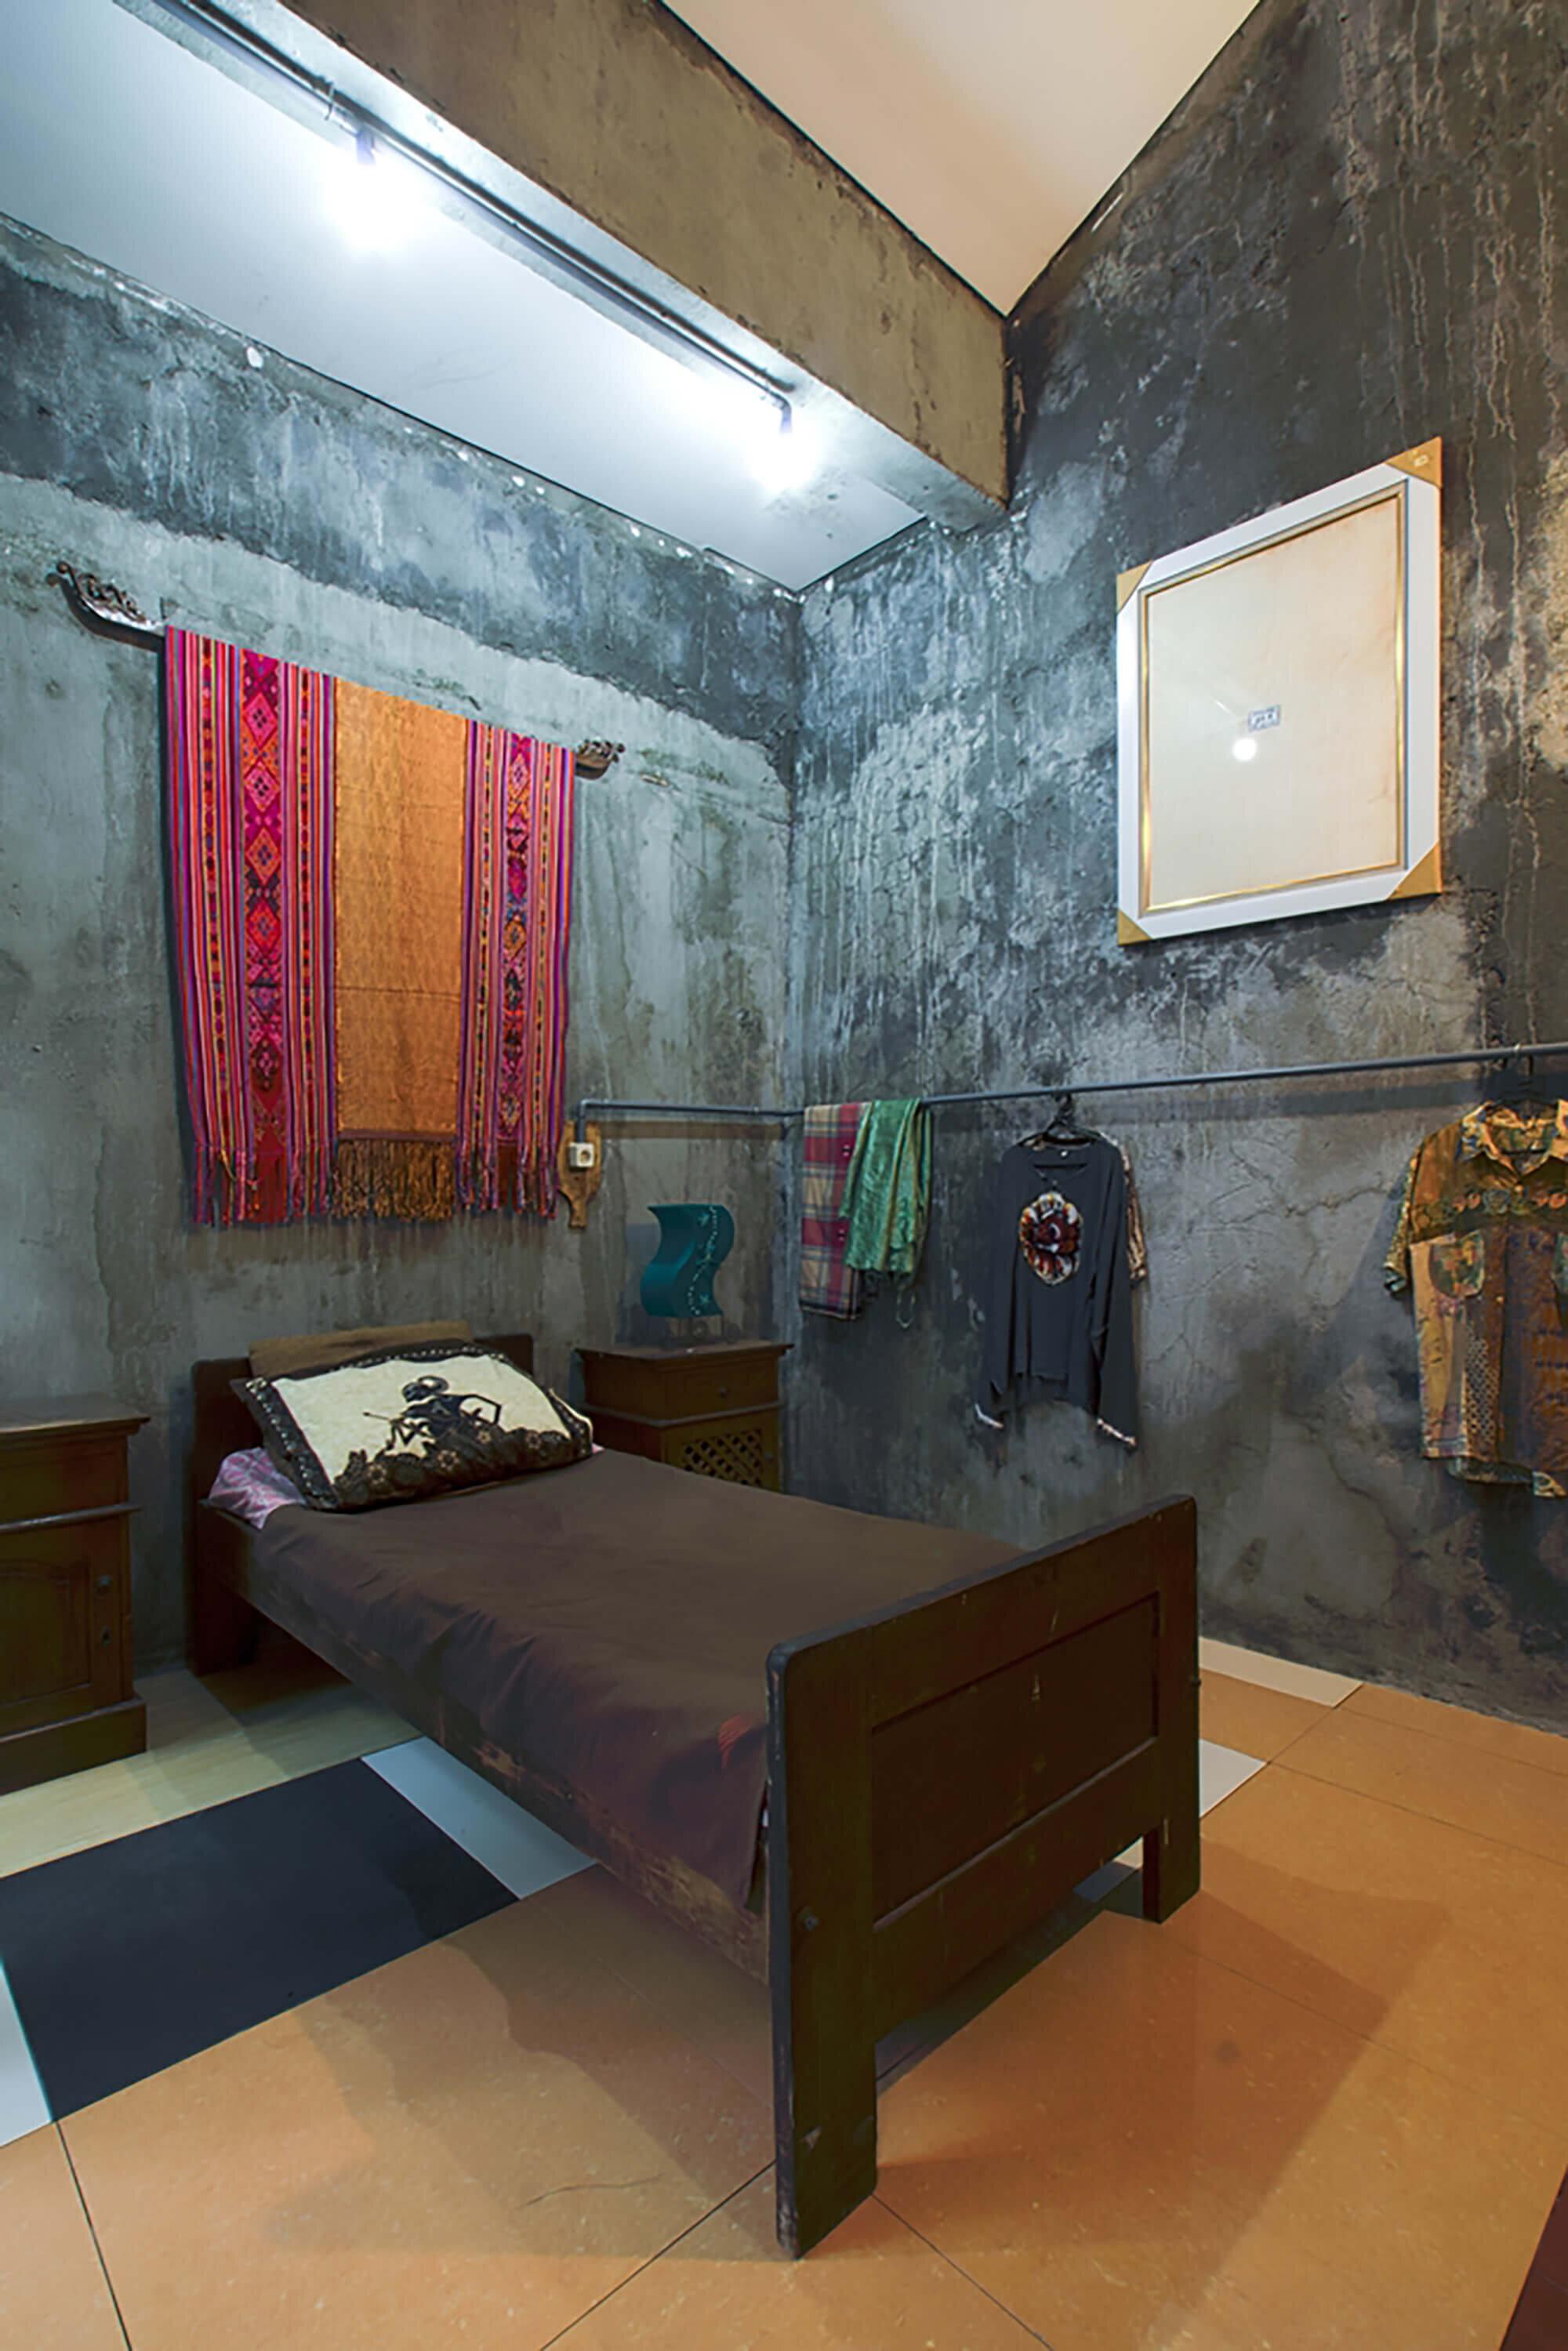 The-Obsolete-House-Omah-Amoh-Gayuh-Budi-Utomo-Indonesia-5